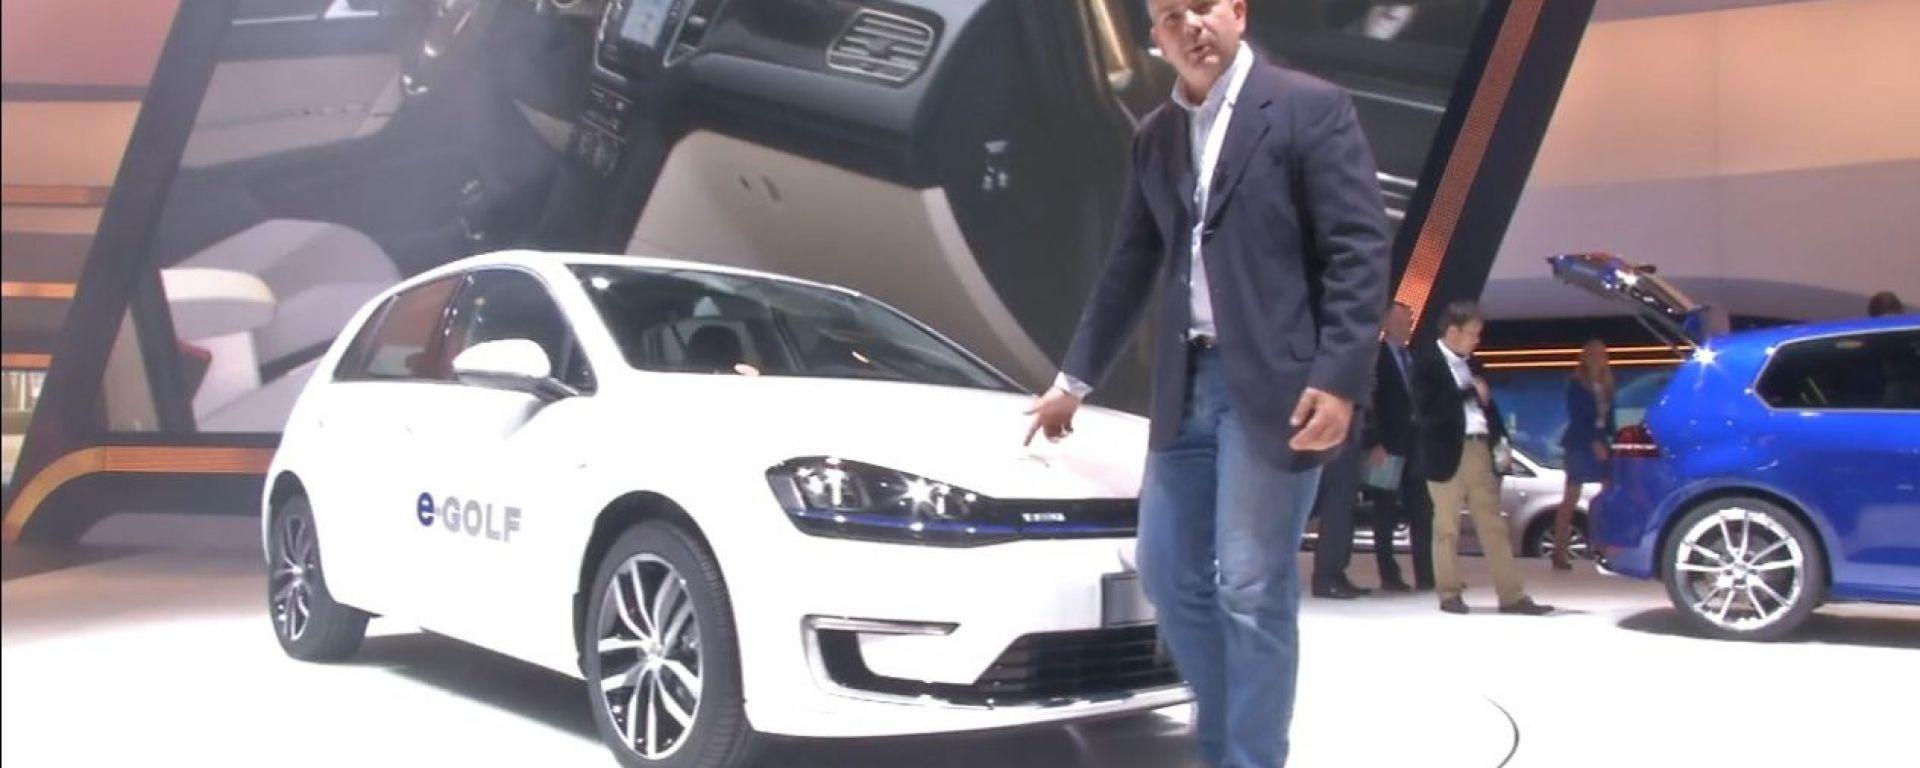 Francoforte 2013, lo stand Volkswagen